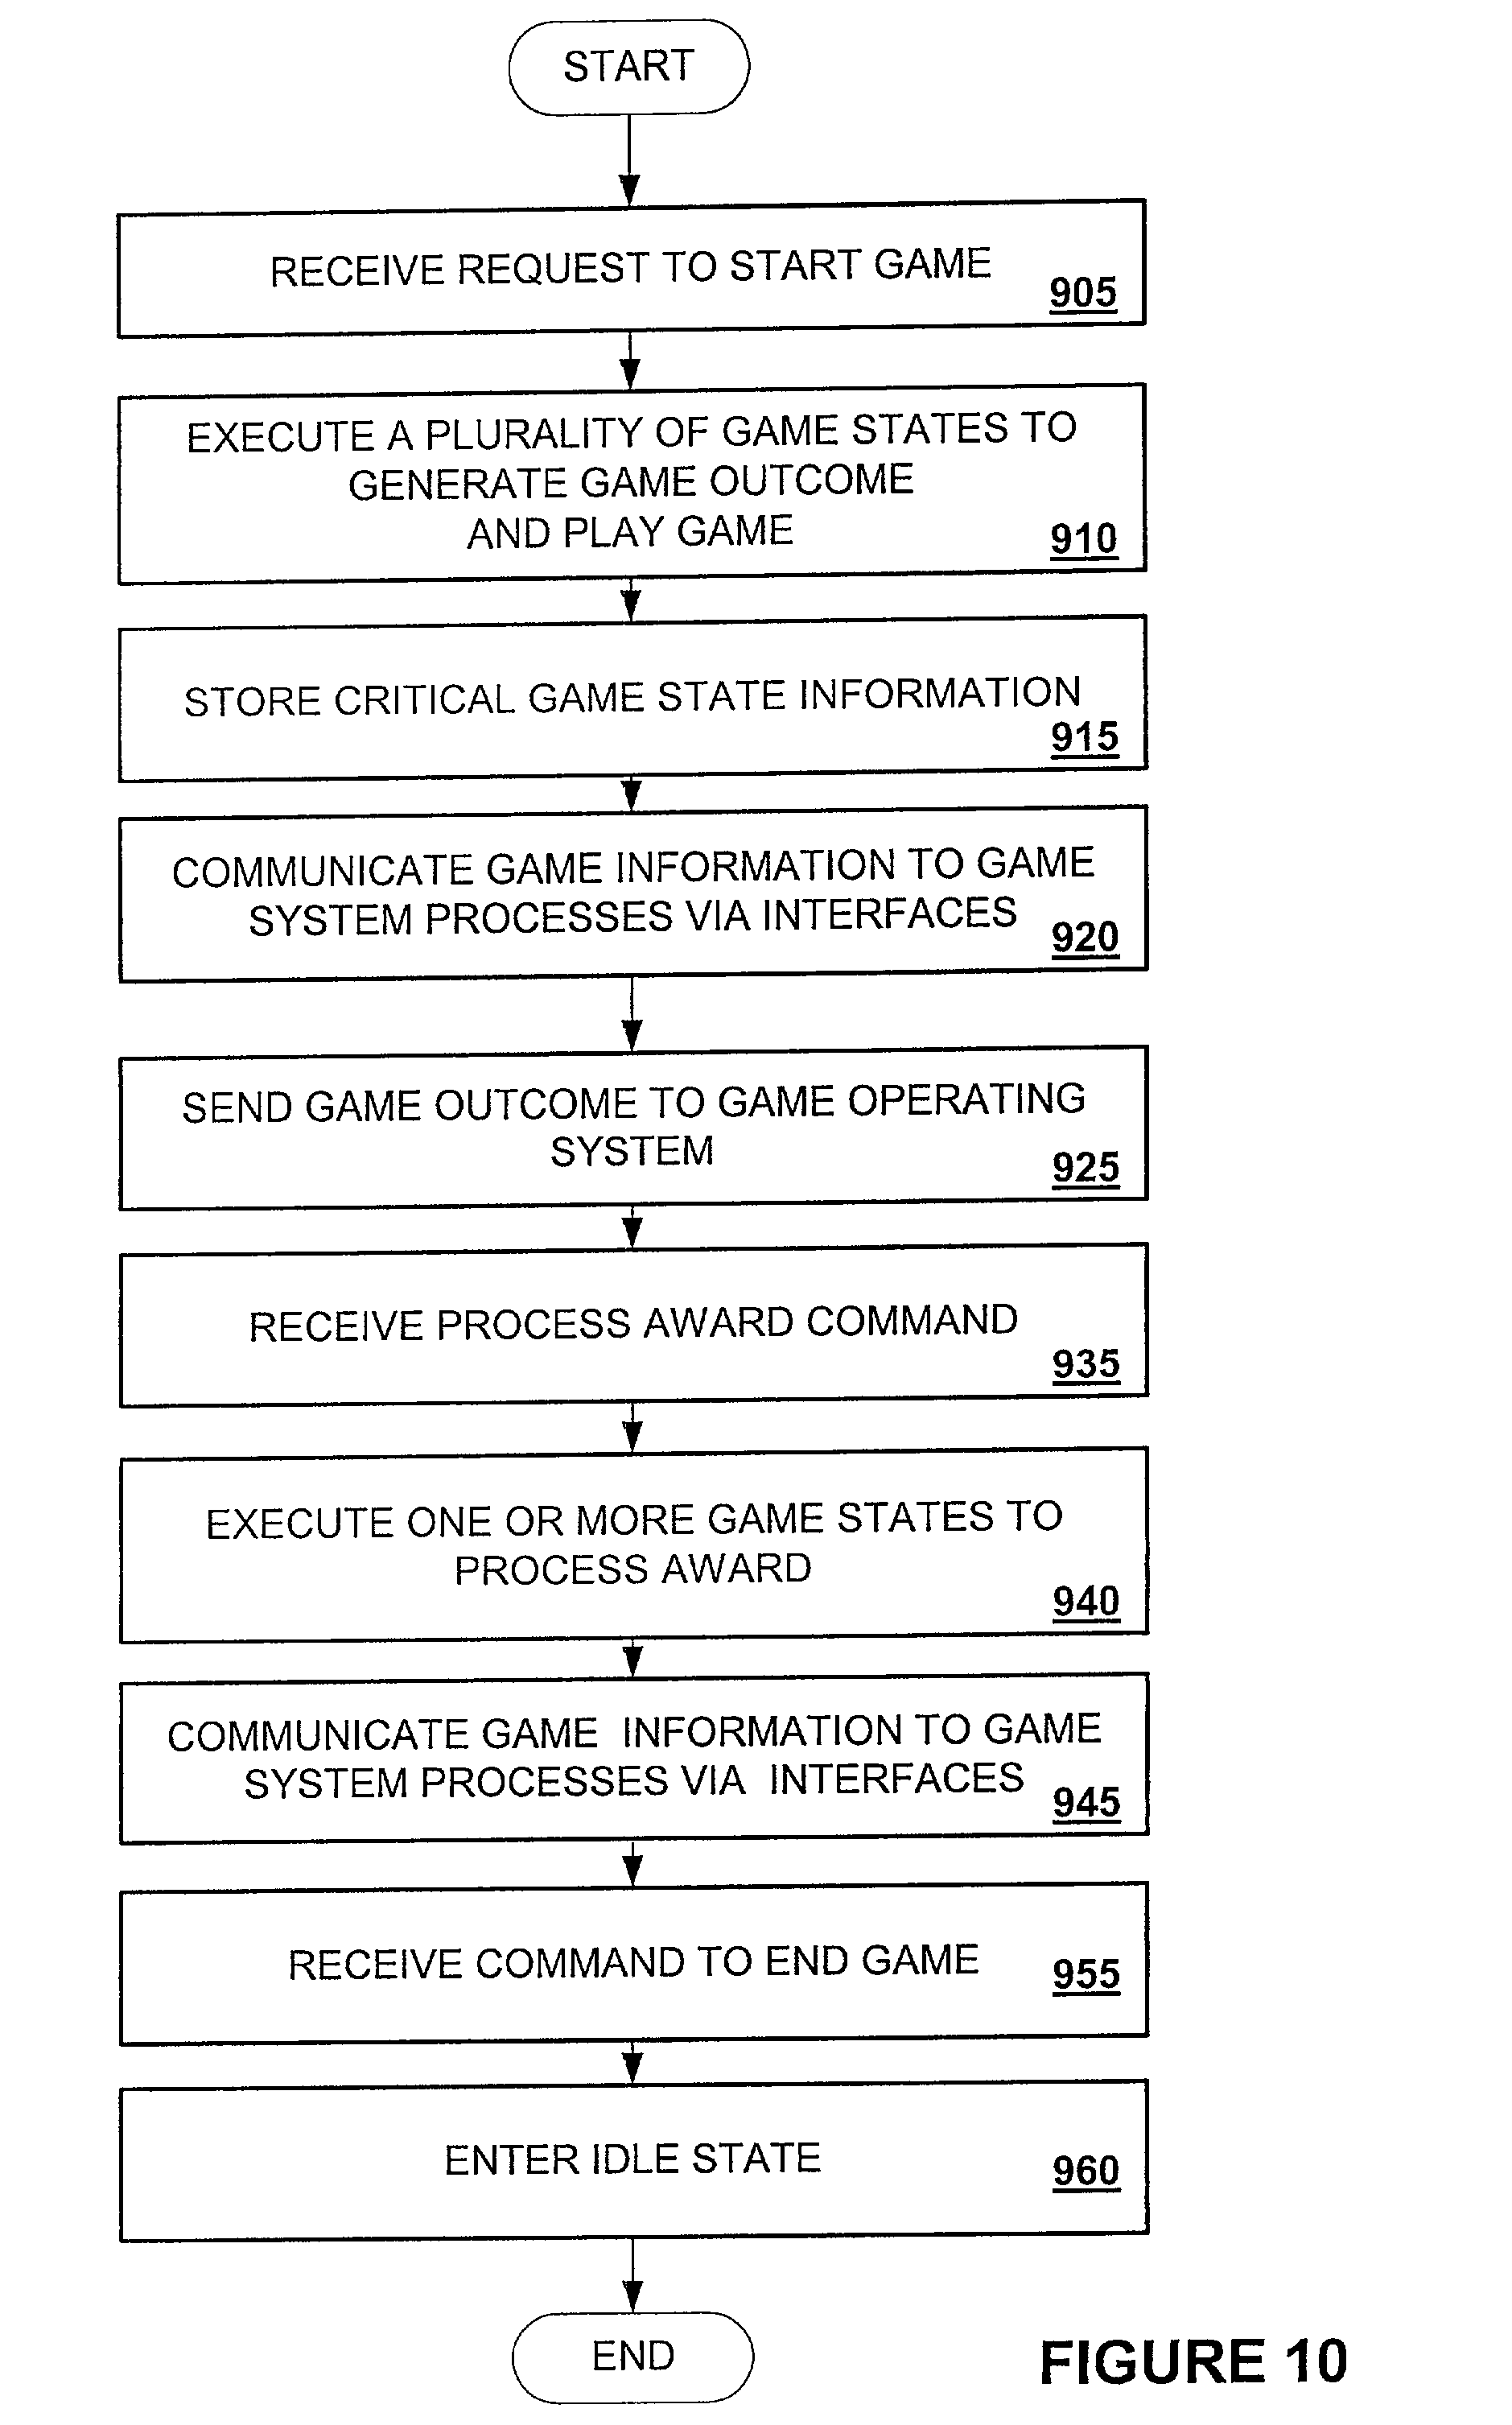 Patent US 7,931,533 B2